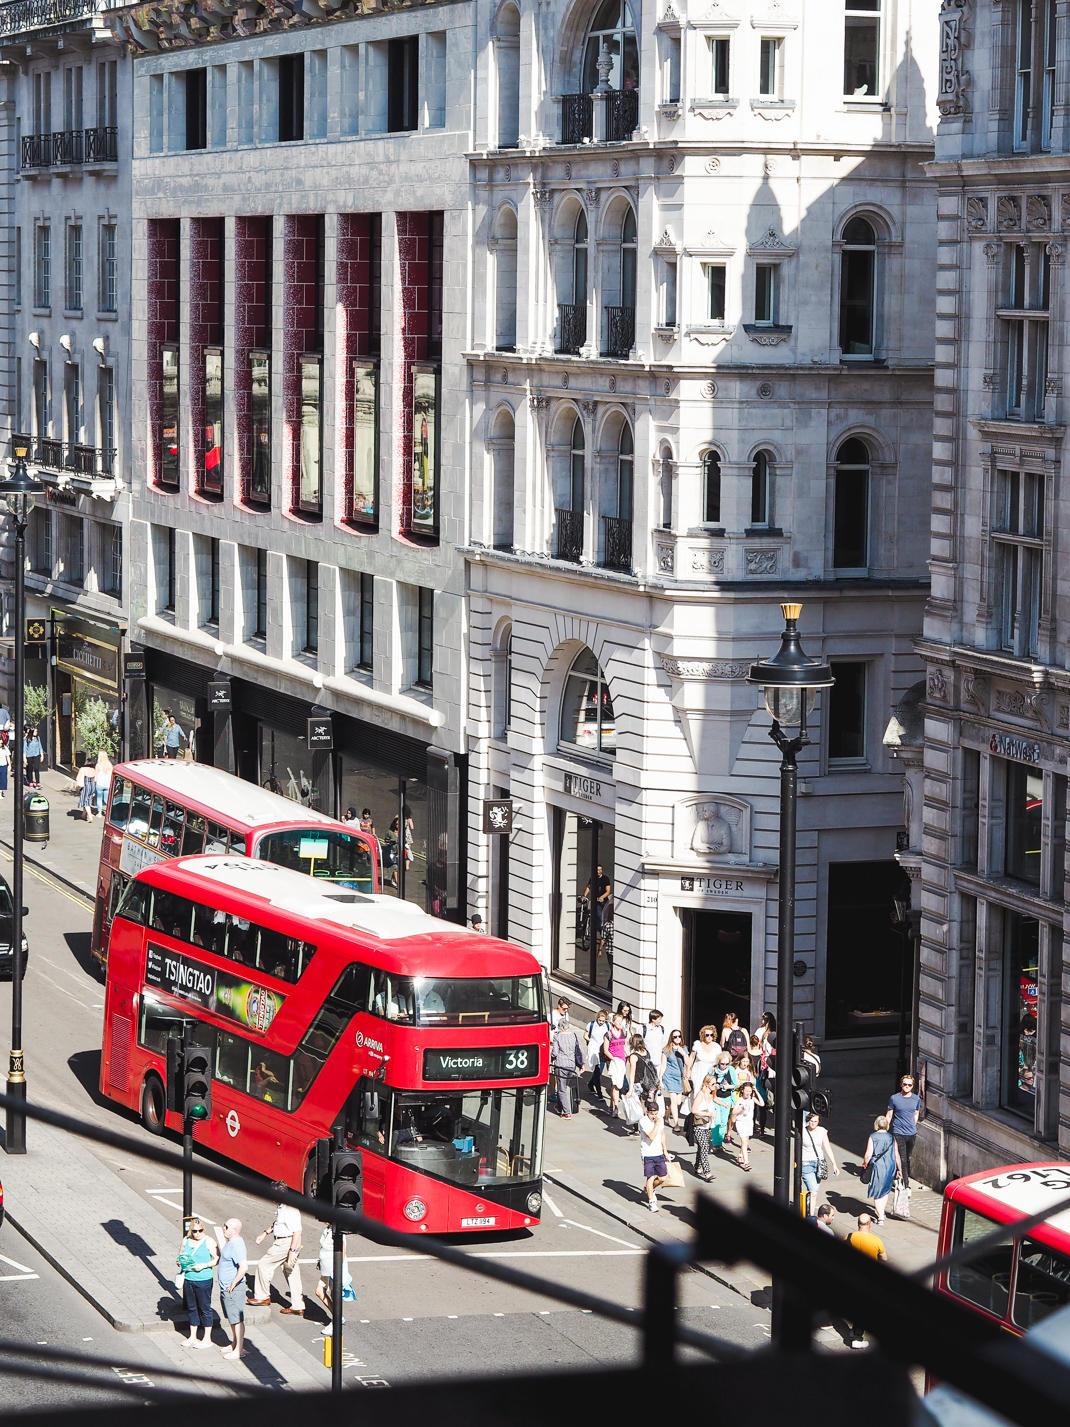 Le Meridien Piccadilly afternoon tea in London